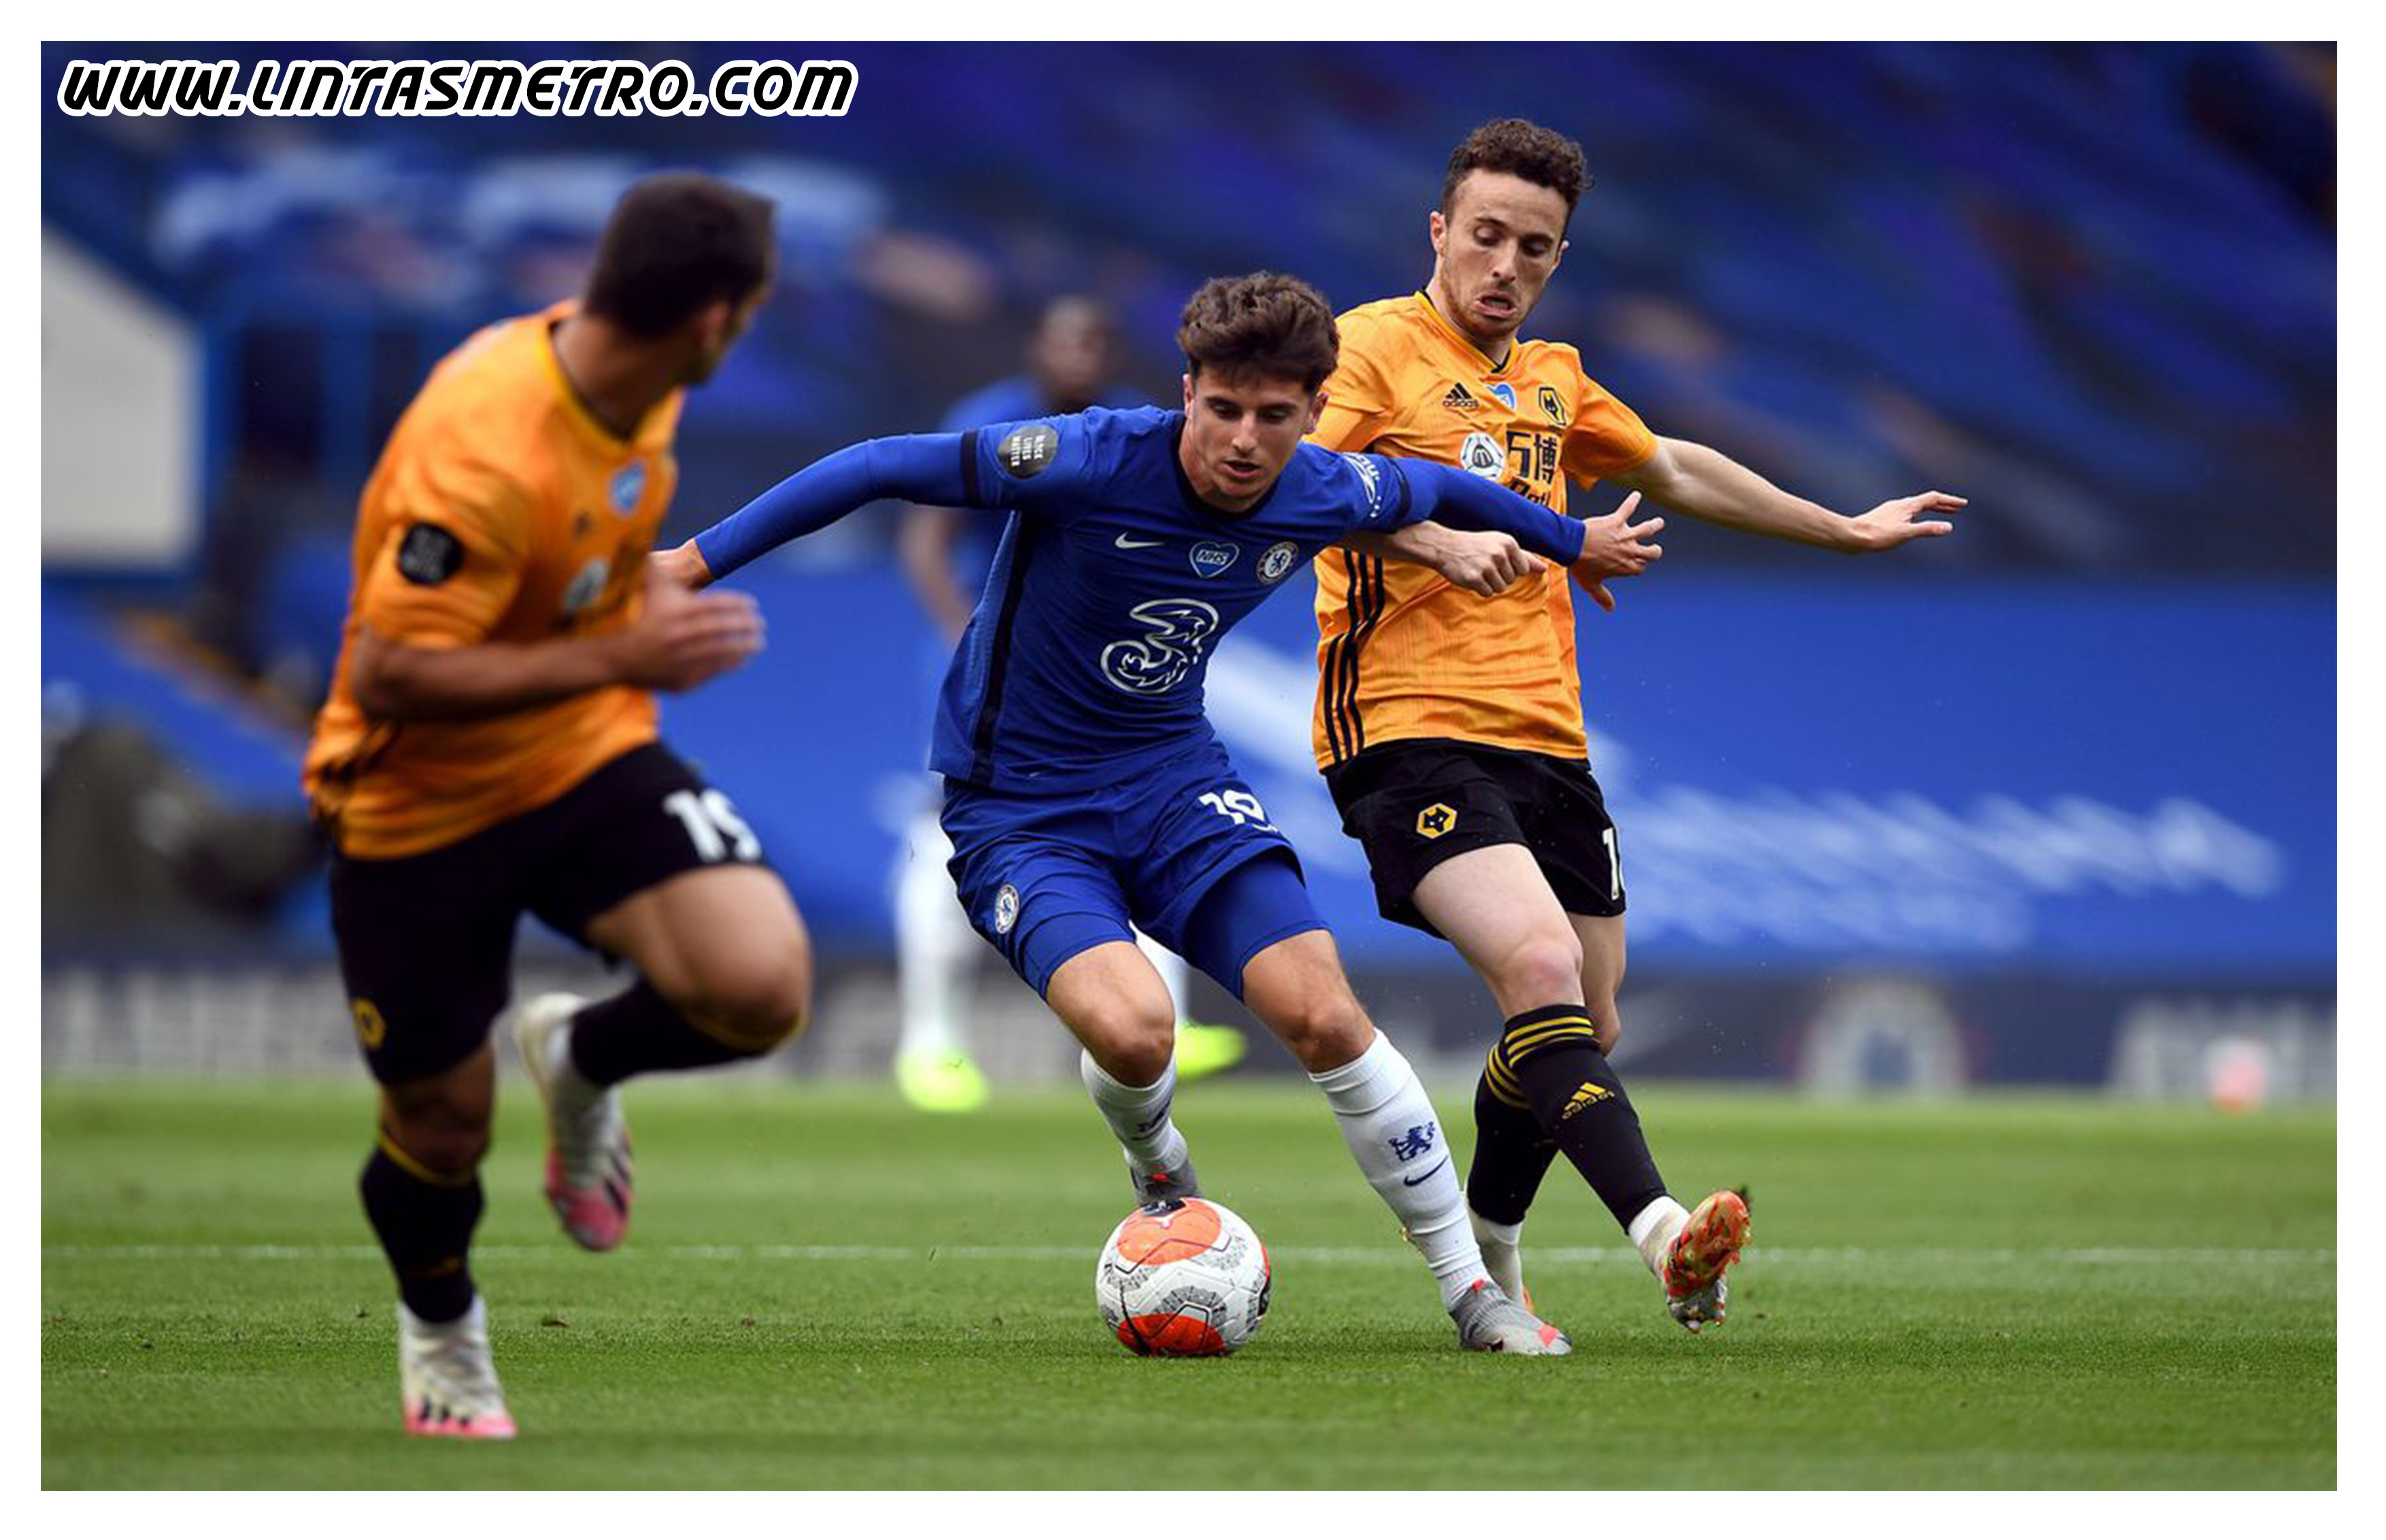 Wolverhampton vs Chelsea Prediksi Liga Inggris 2020/21